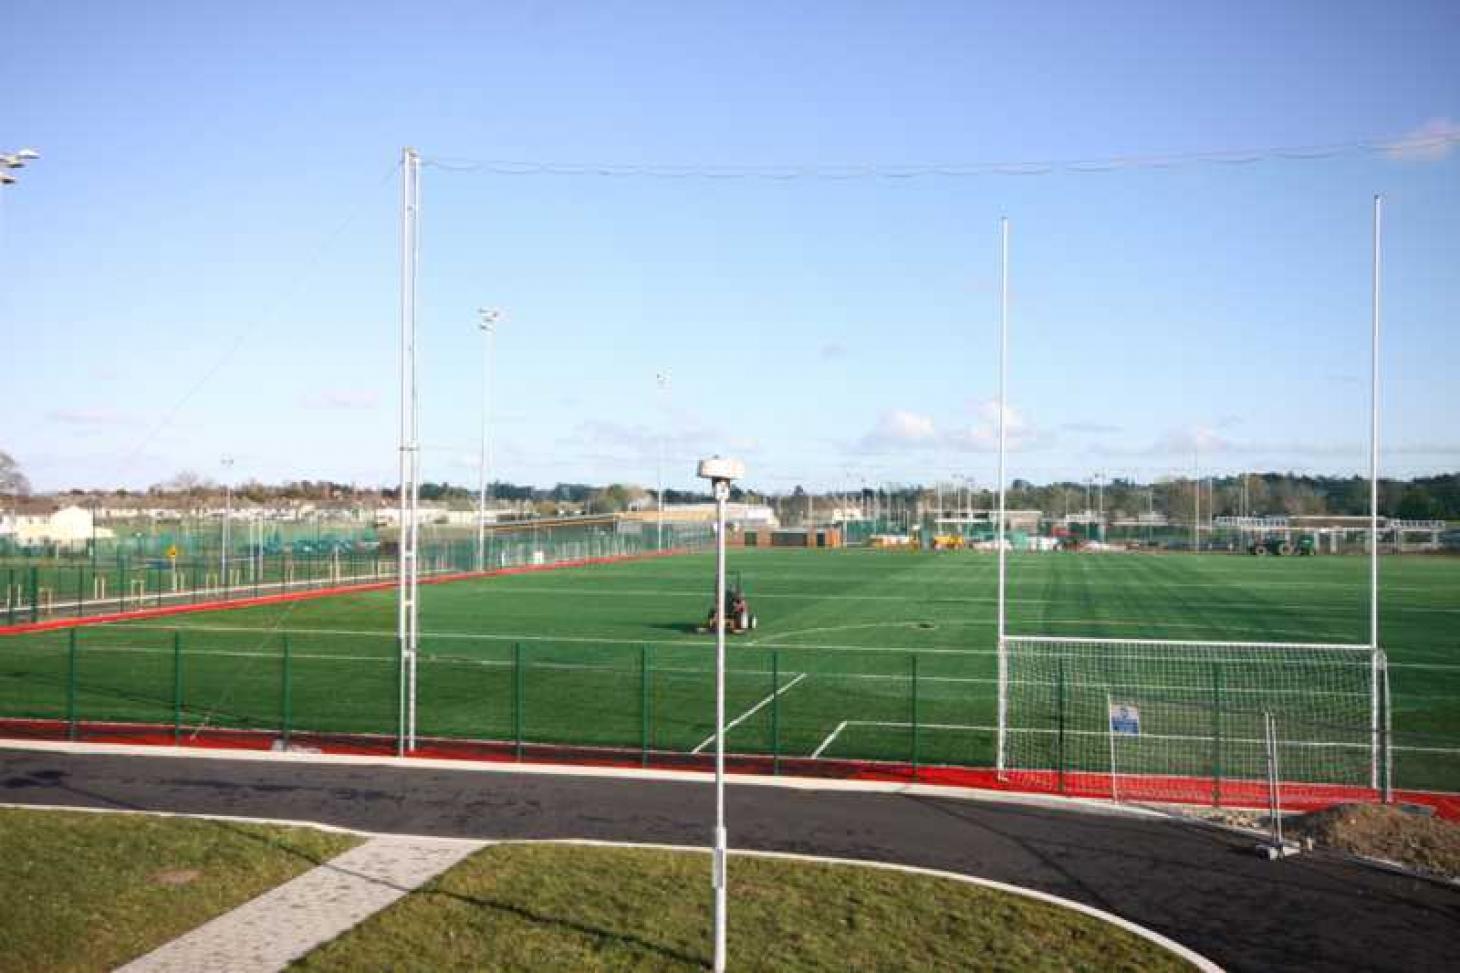 Ballinteer Community School 11 a side | Astroturf football pitch